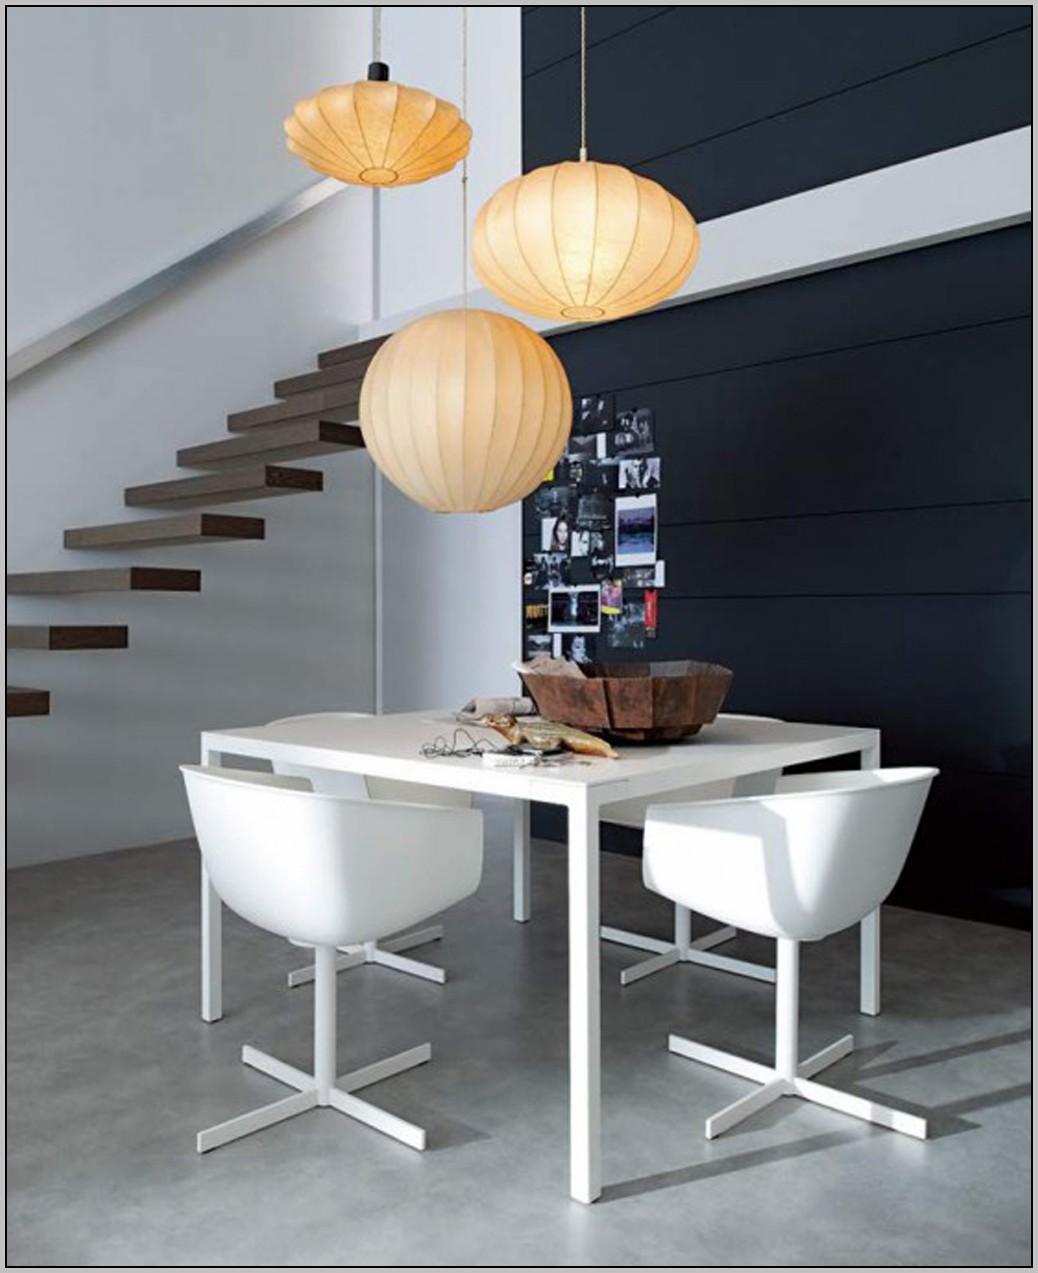 Full Spectrum Desk Lamp Bed Bath Beyond